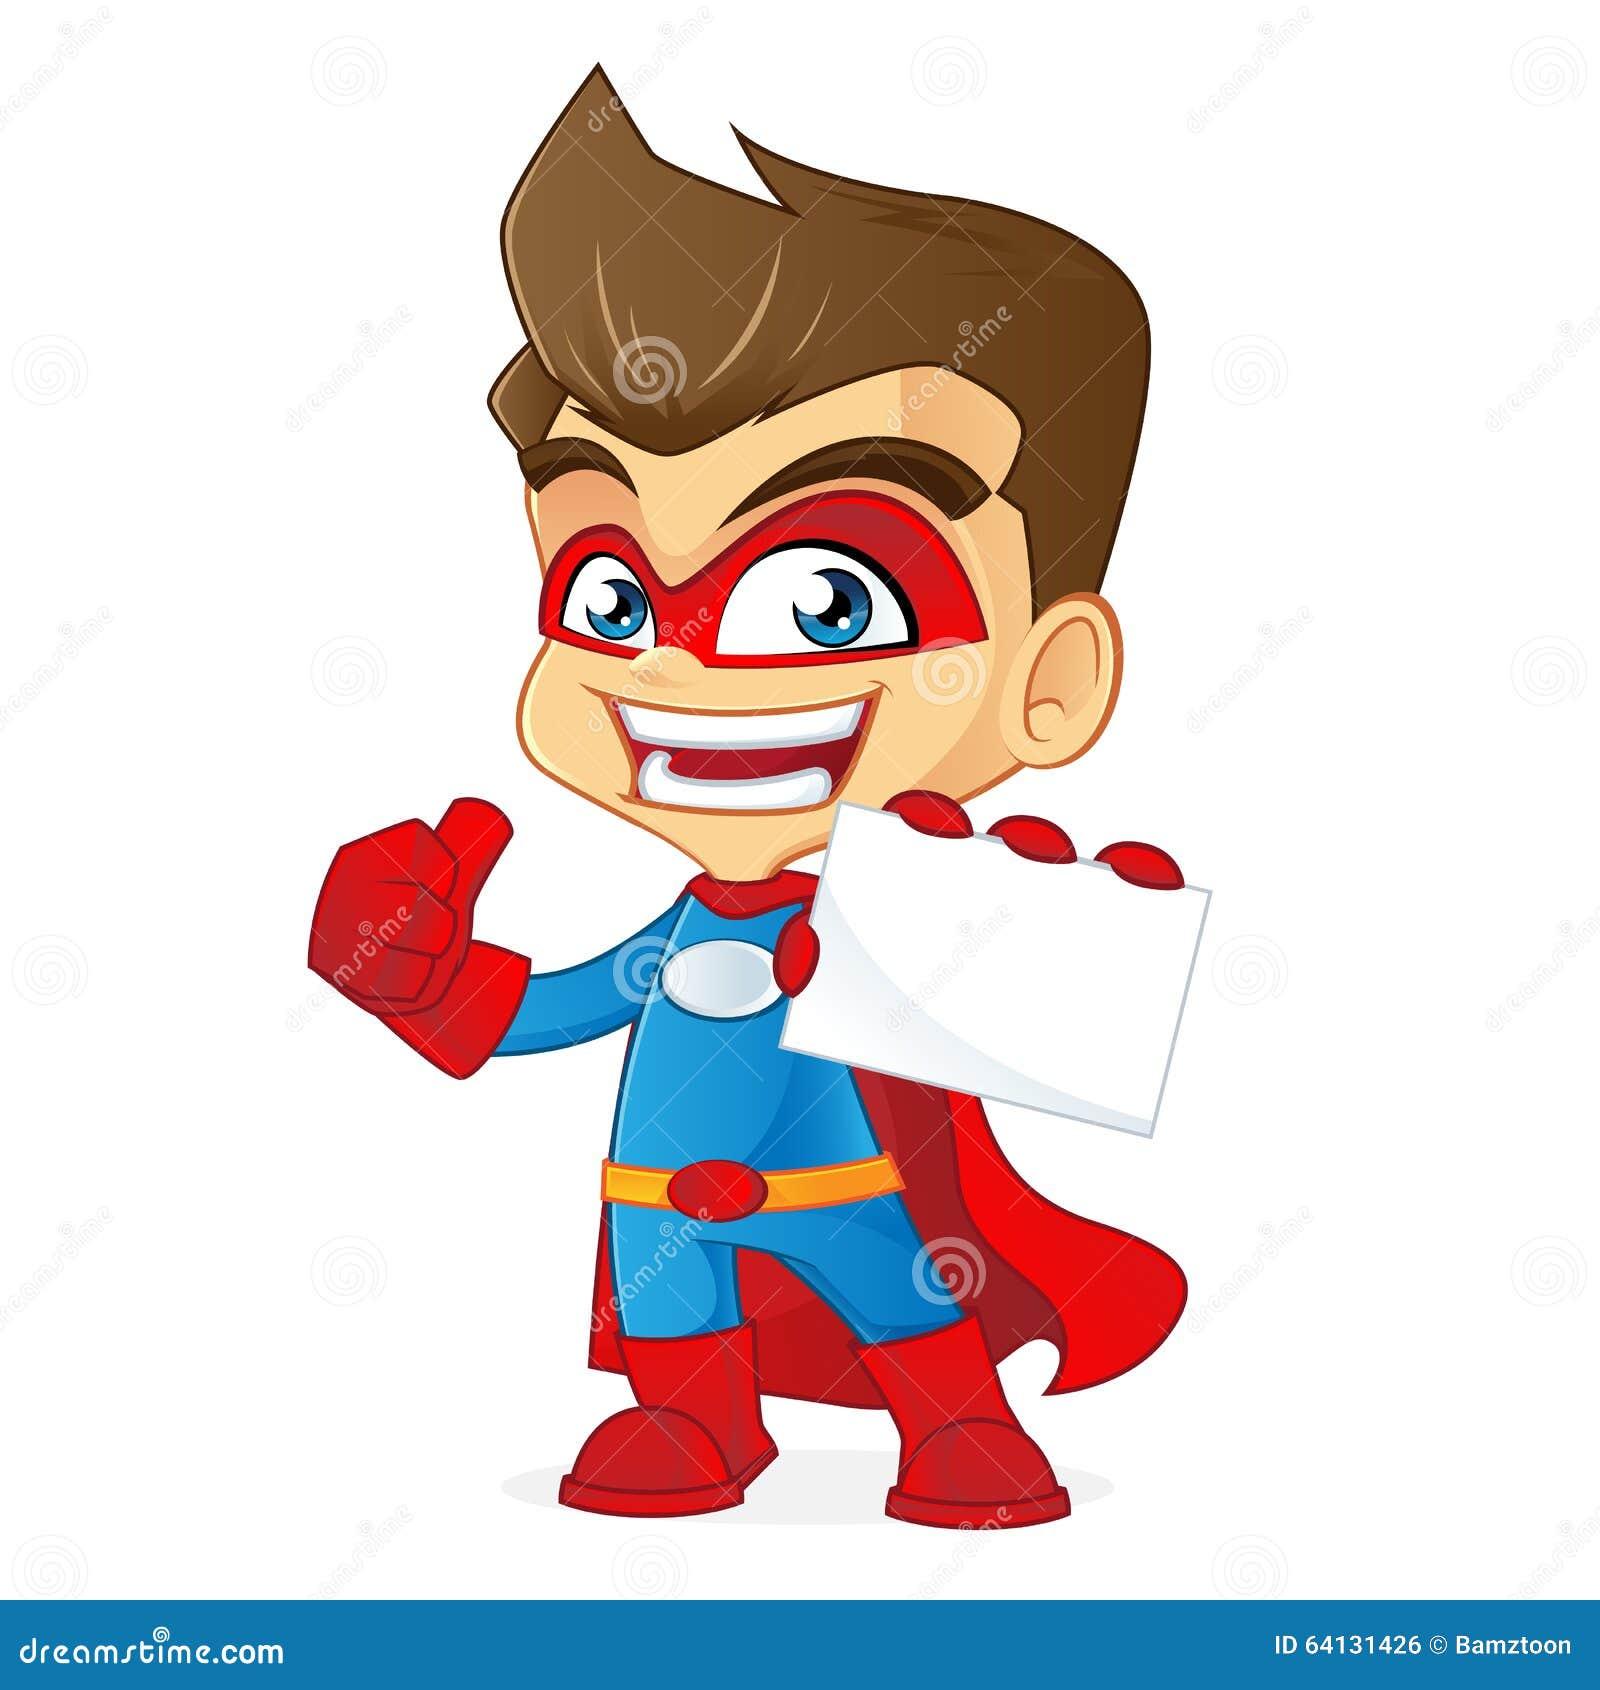 Superhero Holding Business Card Stock Vector - Illustration of ...